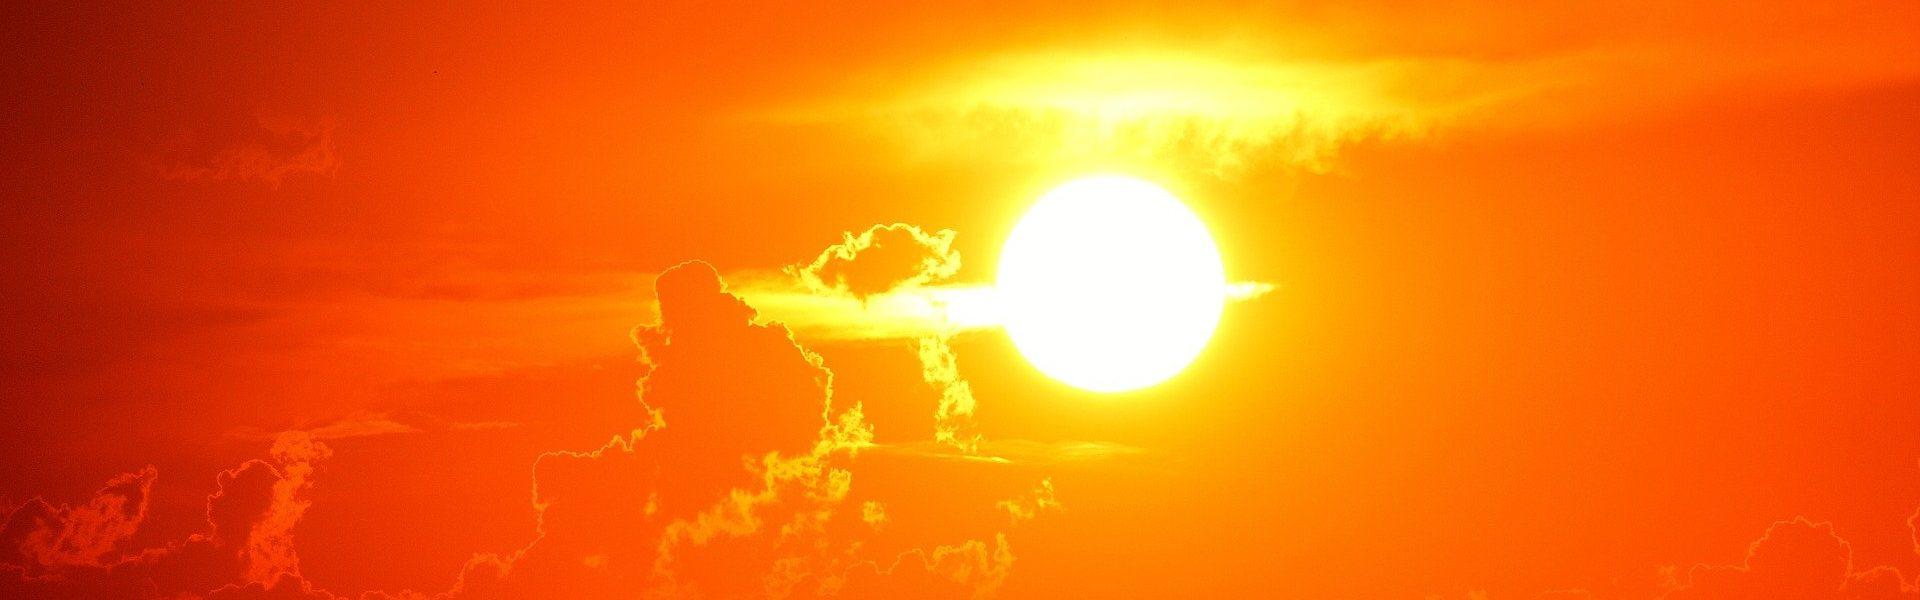 sunset-2180346_1920